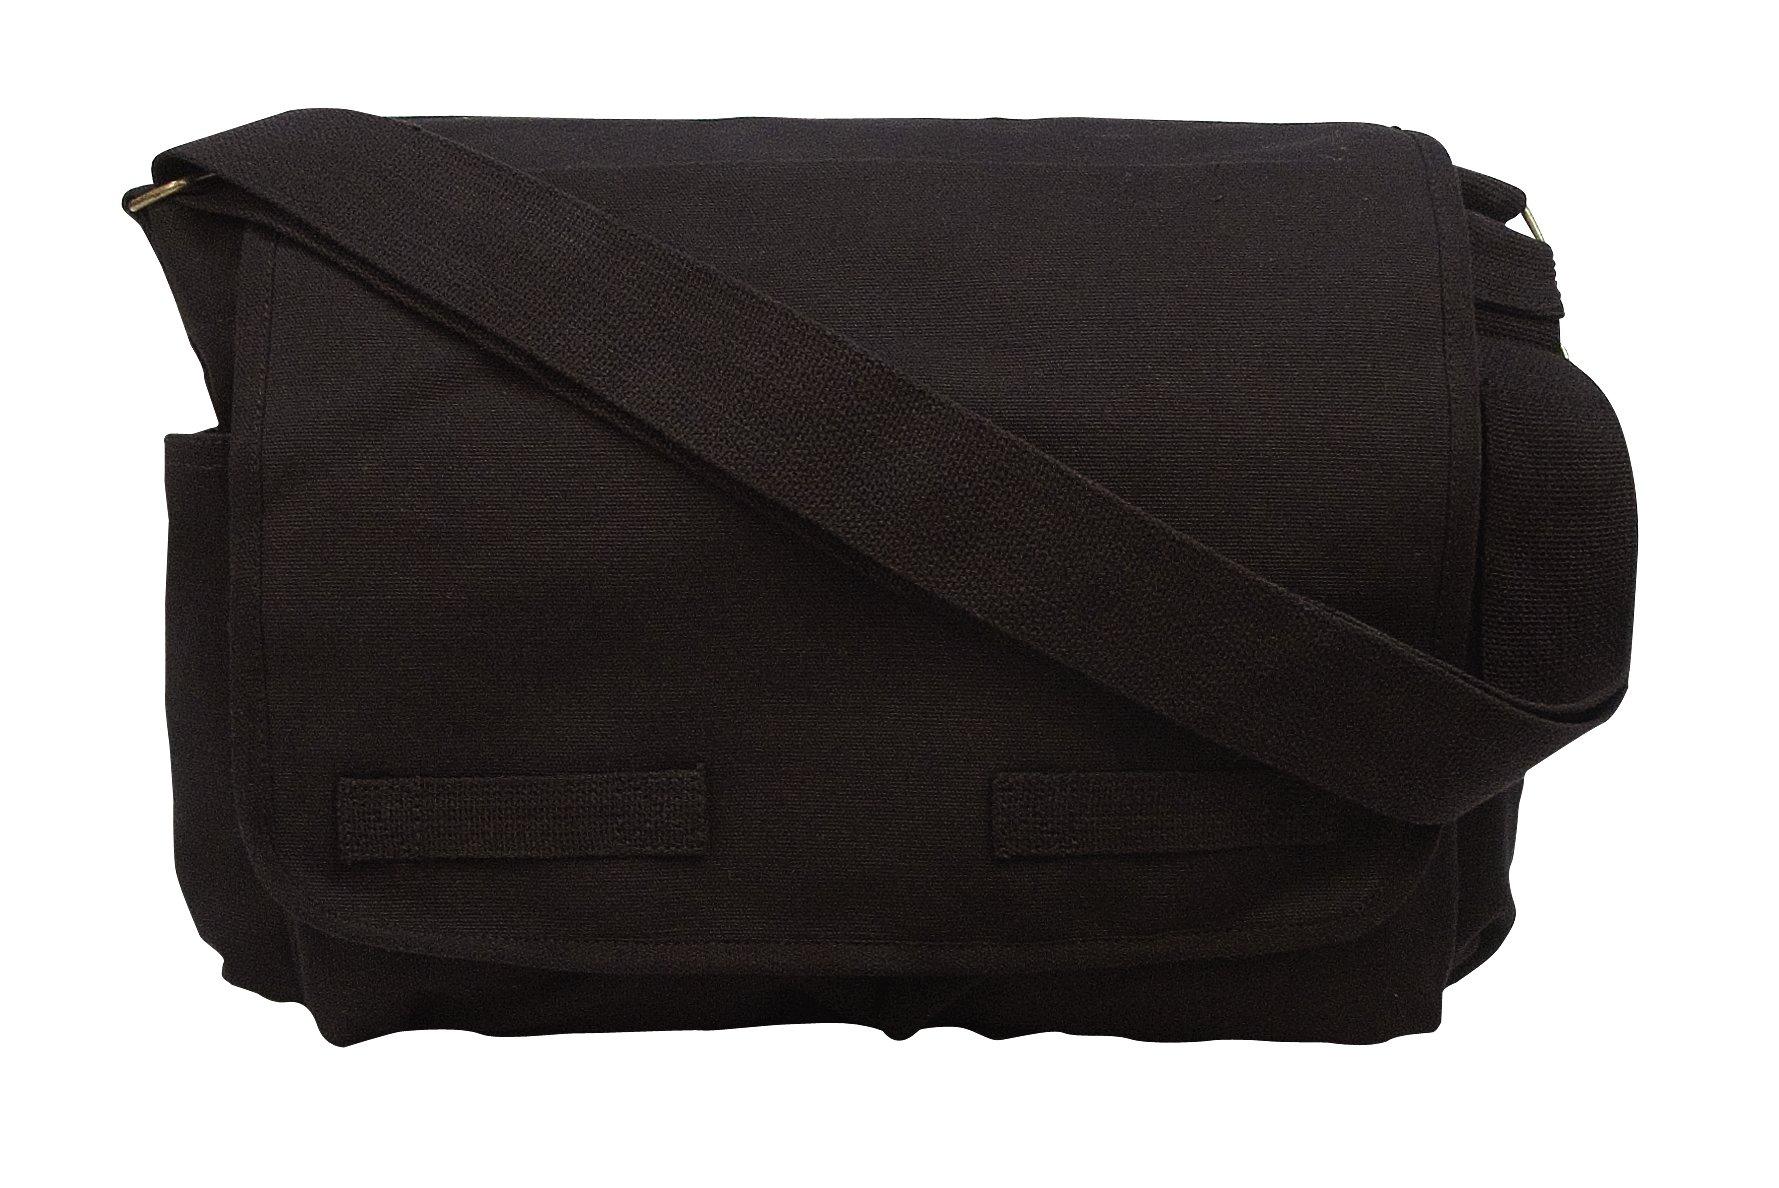 Rothco Hw Canvas Classic Messenger Bag, Black